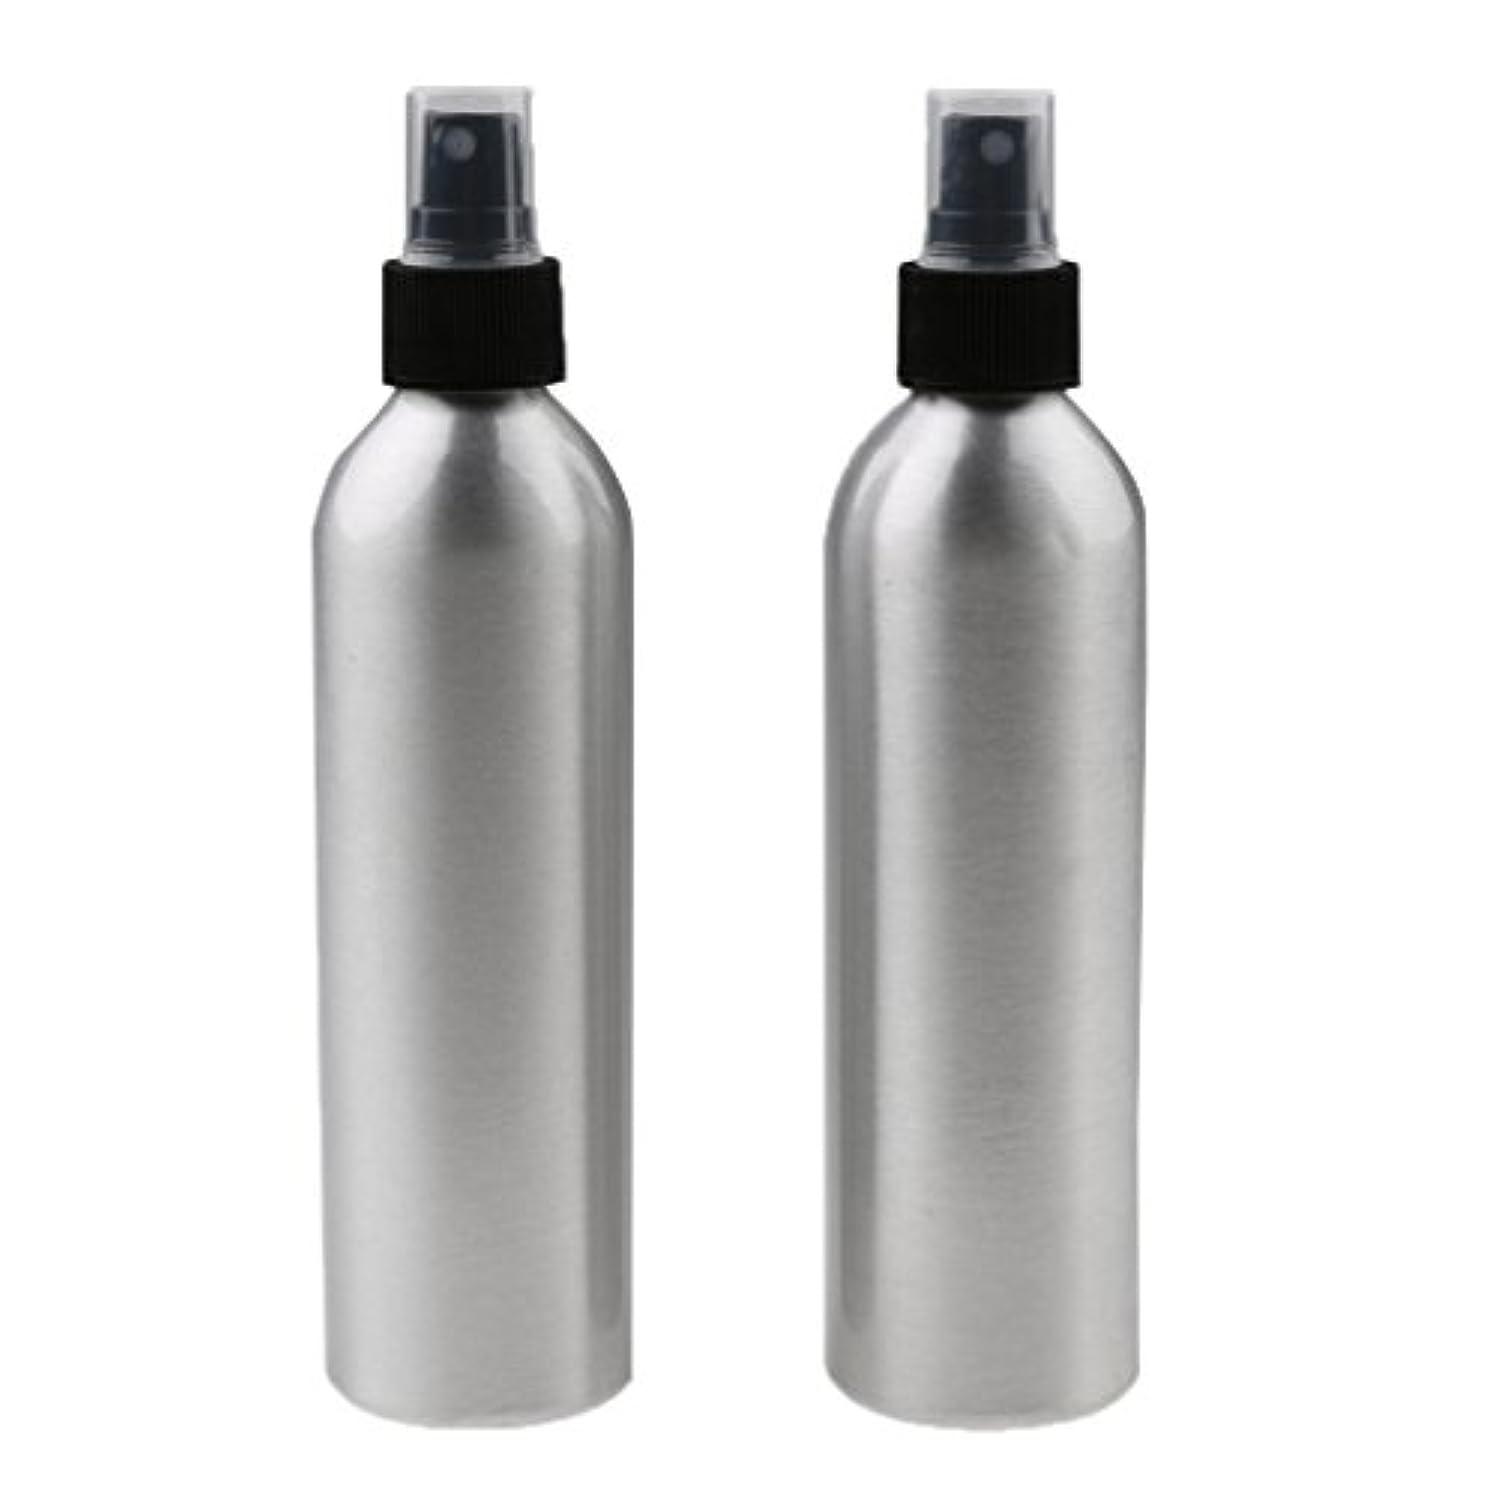 SONONIA 2個入り 旅行 アルミ ミスト スプレー 香水ボトル メイクアップ スプレー アトマイザー 小分けボトル  漏れ防止 出張 海外旅行用 全4サイズ - 100ml